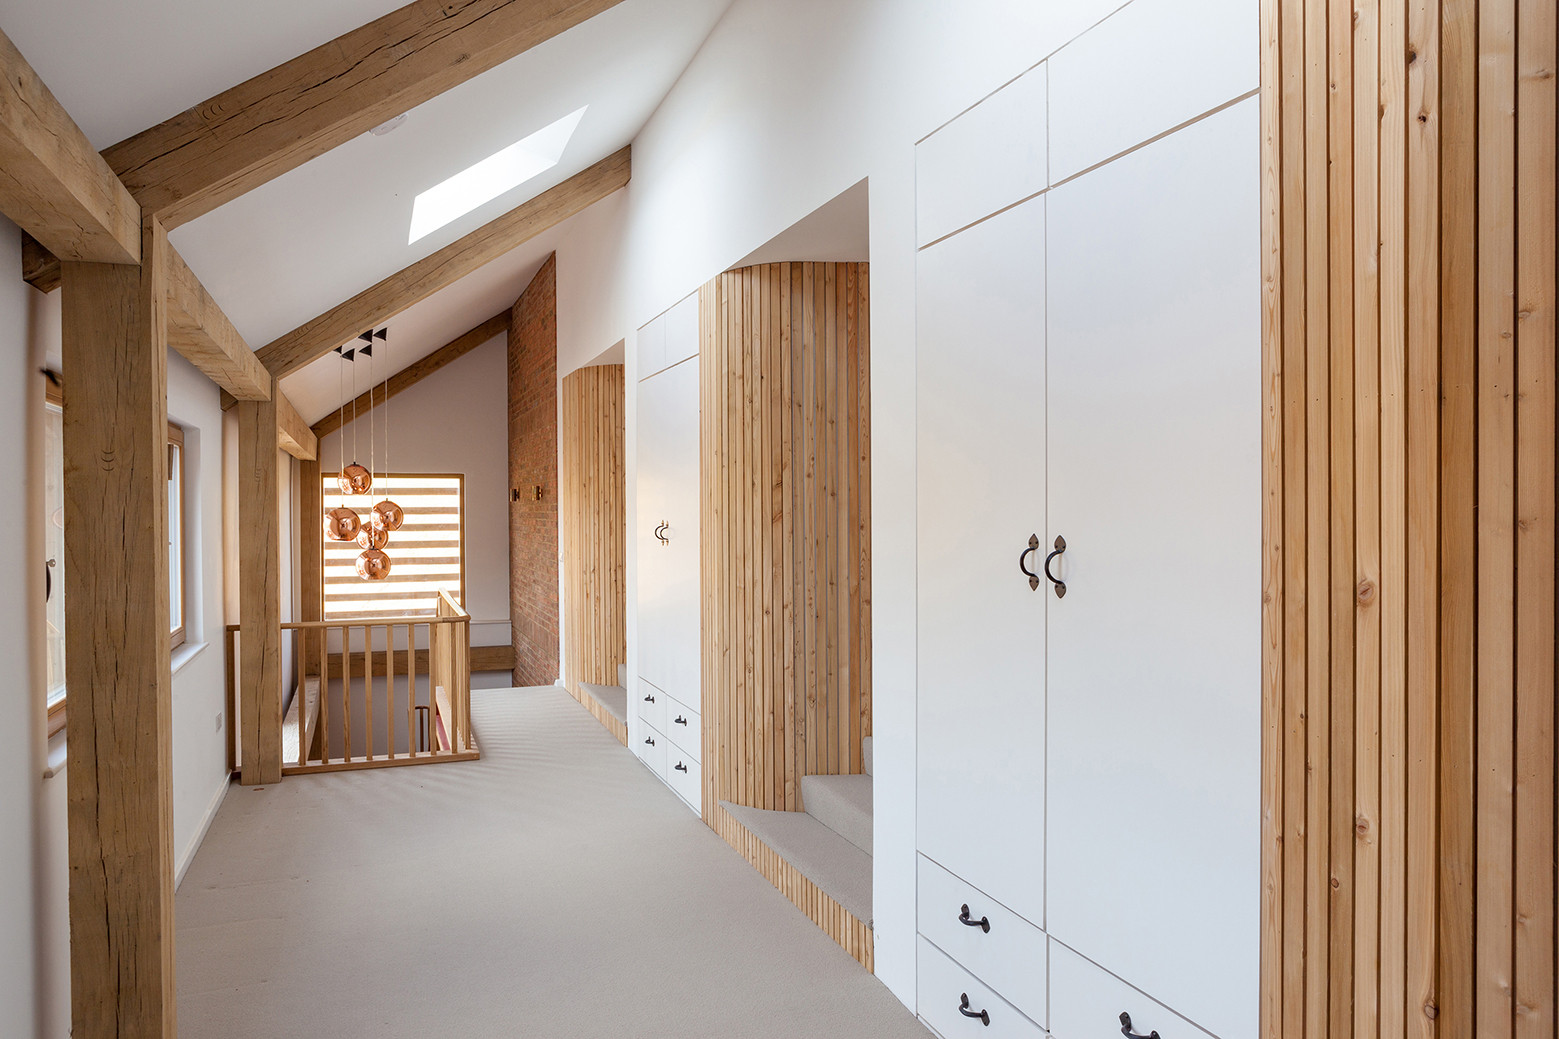 Galería de Casa marcos de madera / A-ZERO architects - 5